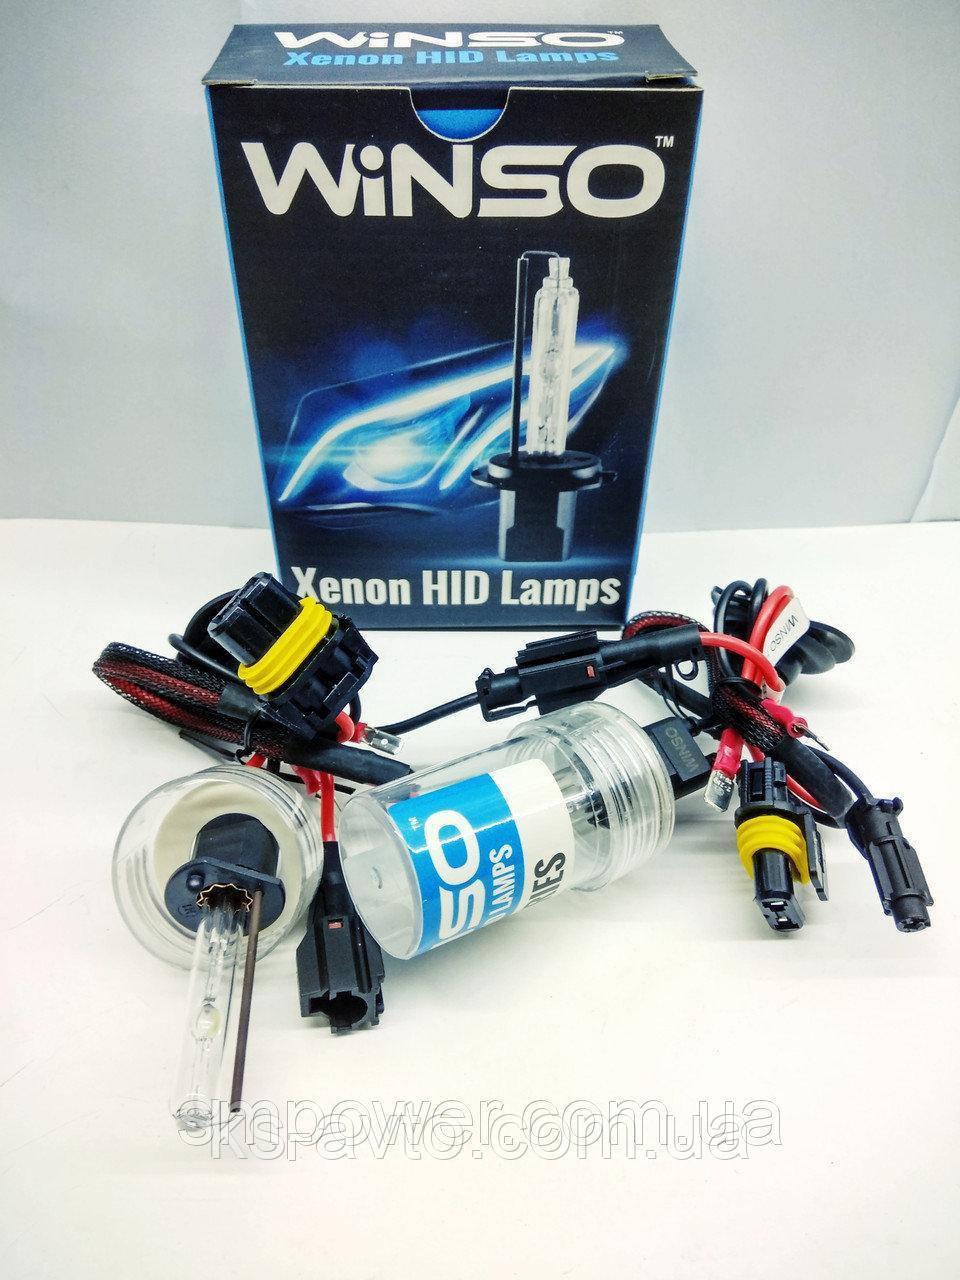 Лампа ксеноновая Winso H27/2, 5000K, 85V, 35W, P14.5s KET, 2 шт.